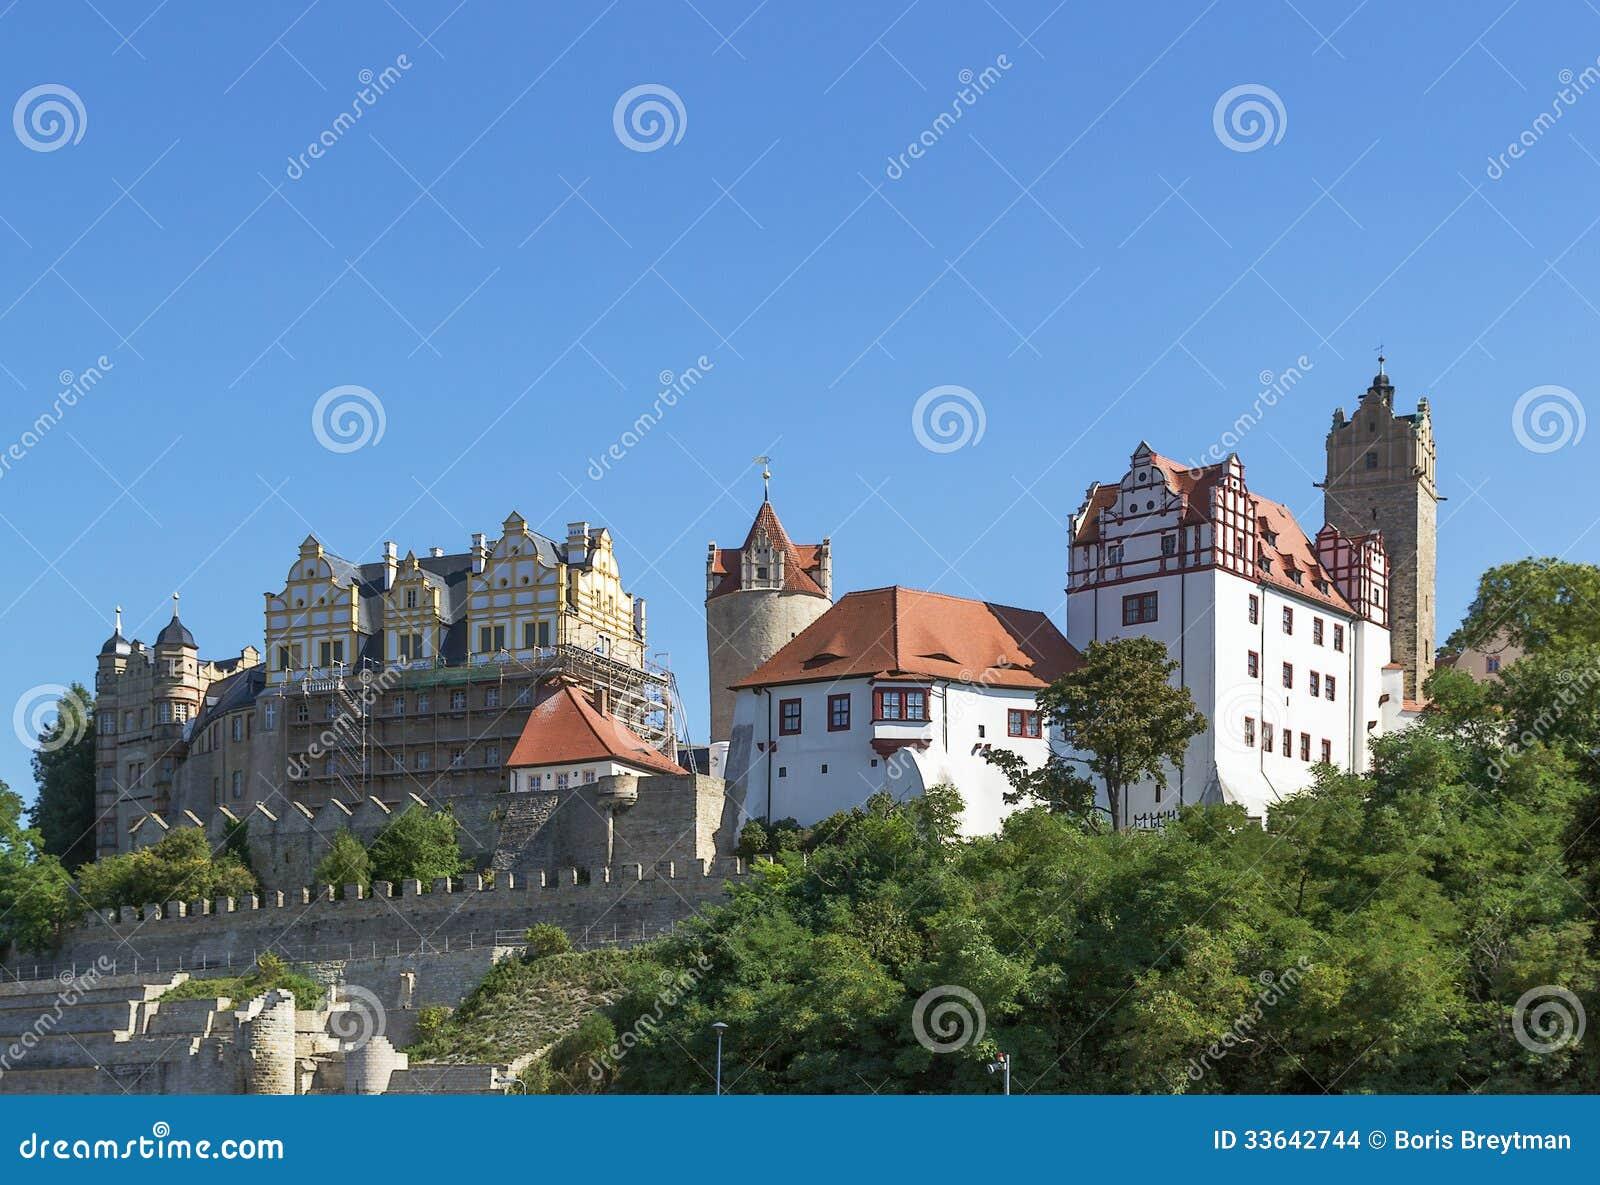 Bernburg Germany  city photos gallery : Castle In Bernburg, Germany Stock Images Image: 33642744